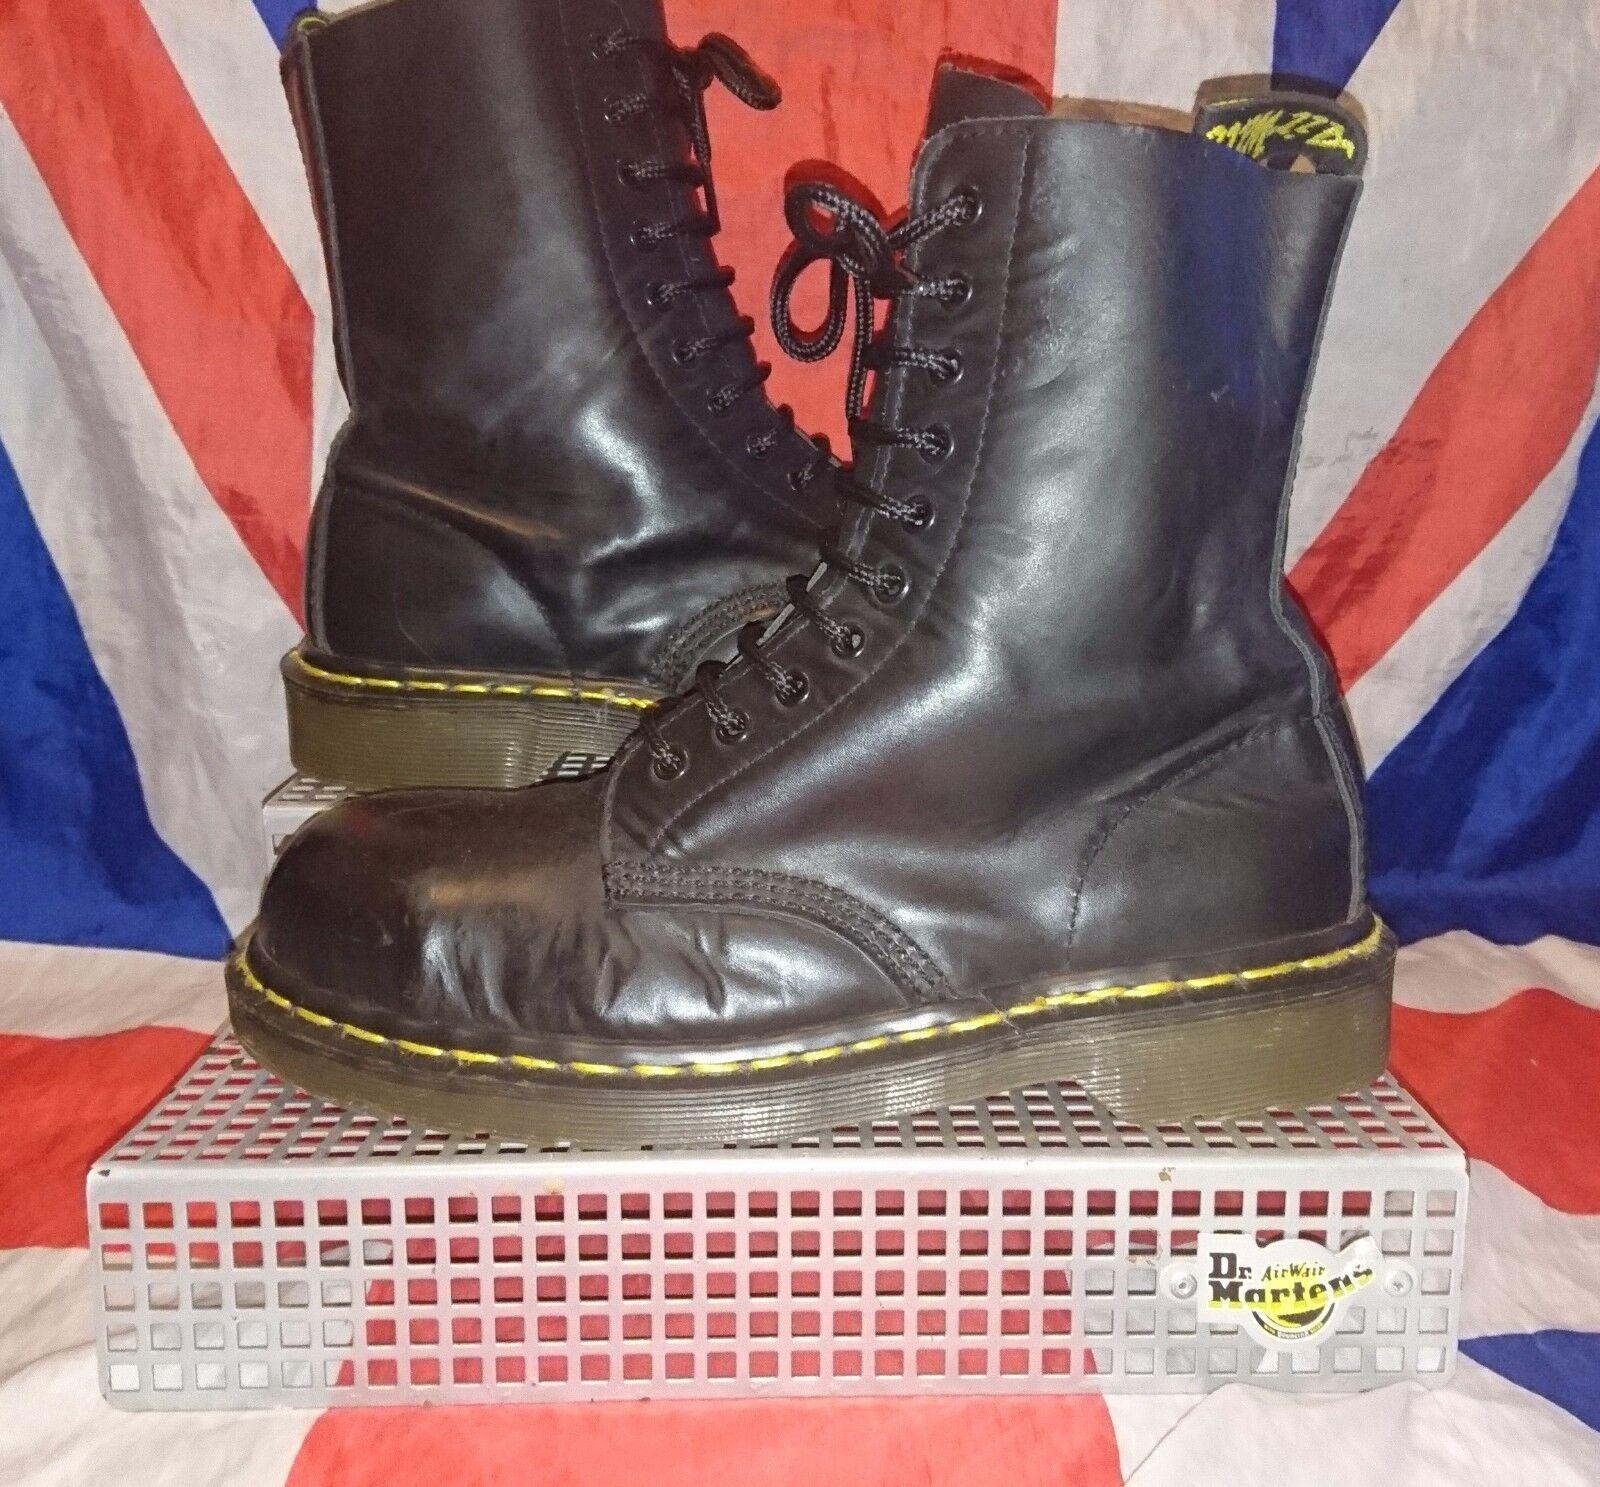 Zapatos especiales con descuento England Vintage*10 Eyelet Steel Toe Dr Doc Martens*Grunge Skingirl Punk Goth*6